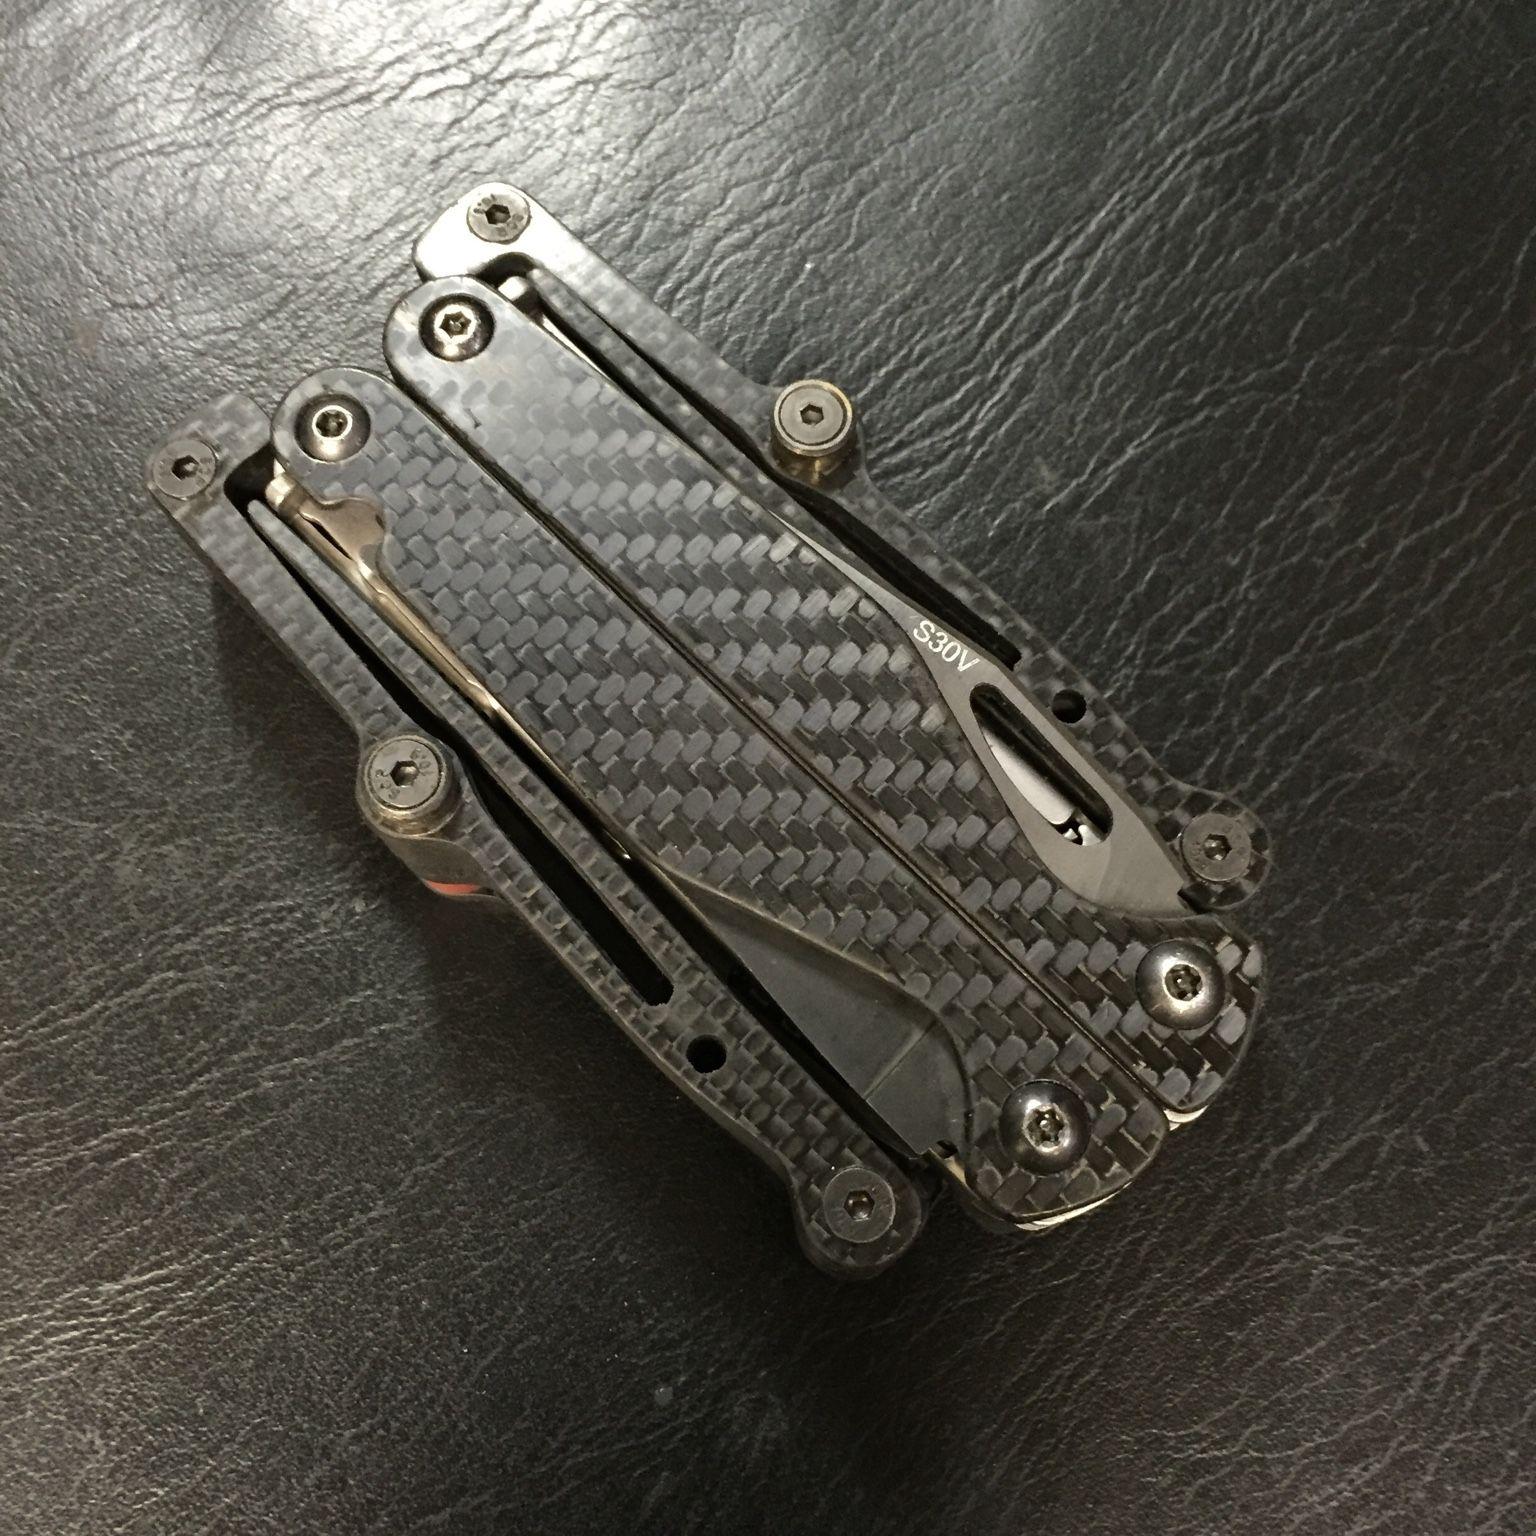 Pin On Multitool Edc